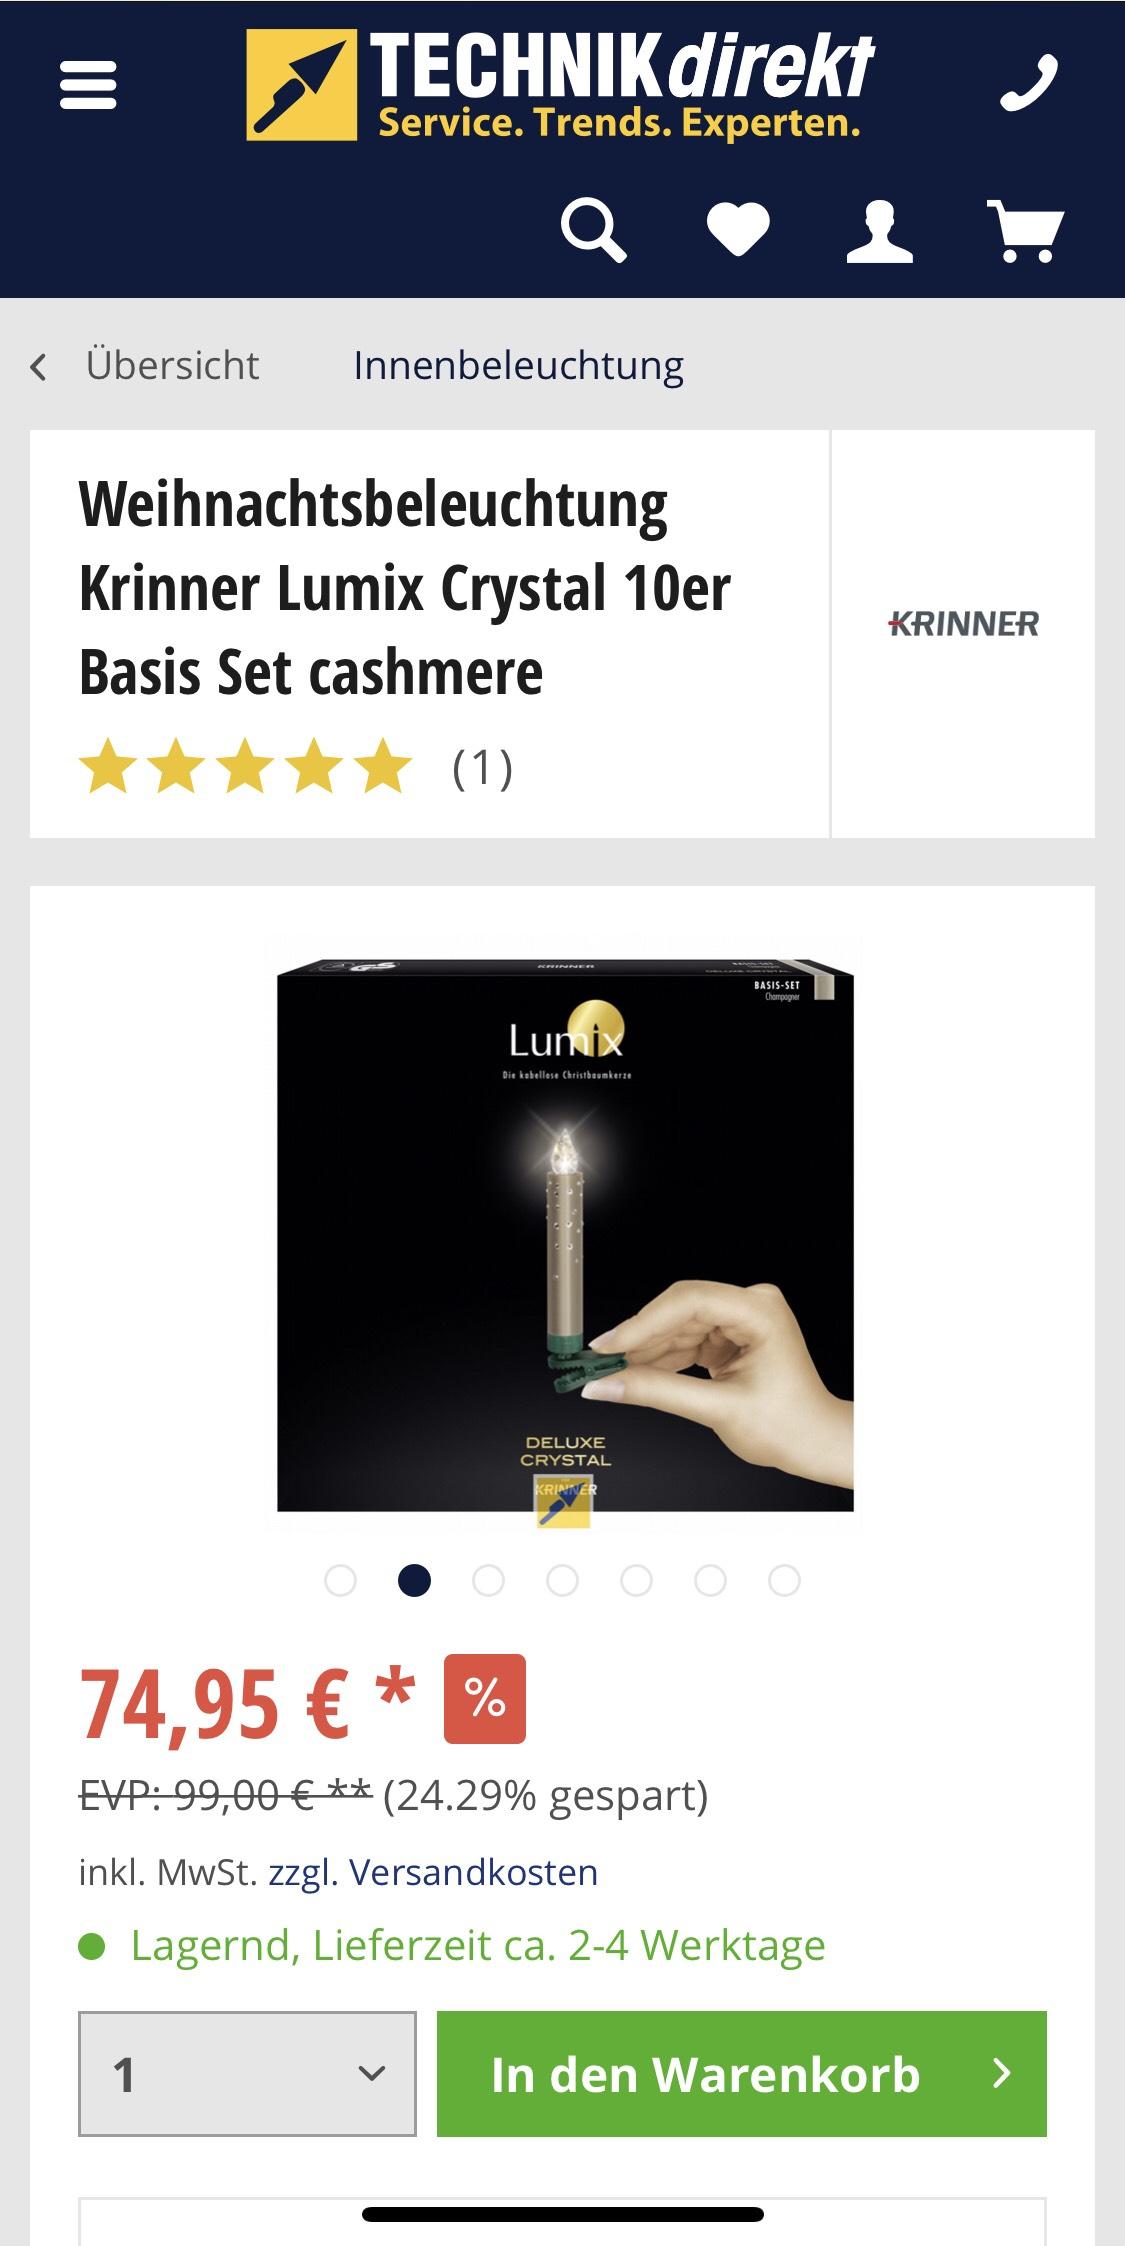 [Technikdirekt.de] Krinner Beleuchtung Lumix Deluxe Crystal 10er Basis Set cashmere, kabellos - 66,94 € Paydirekt Aktion 15€j